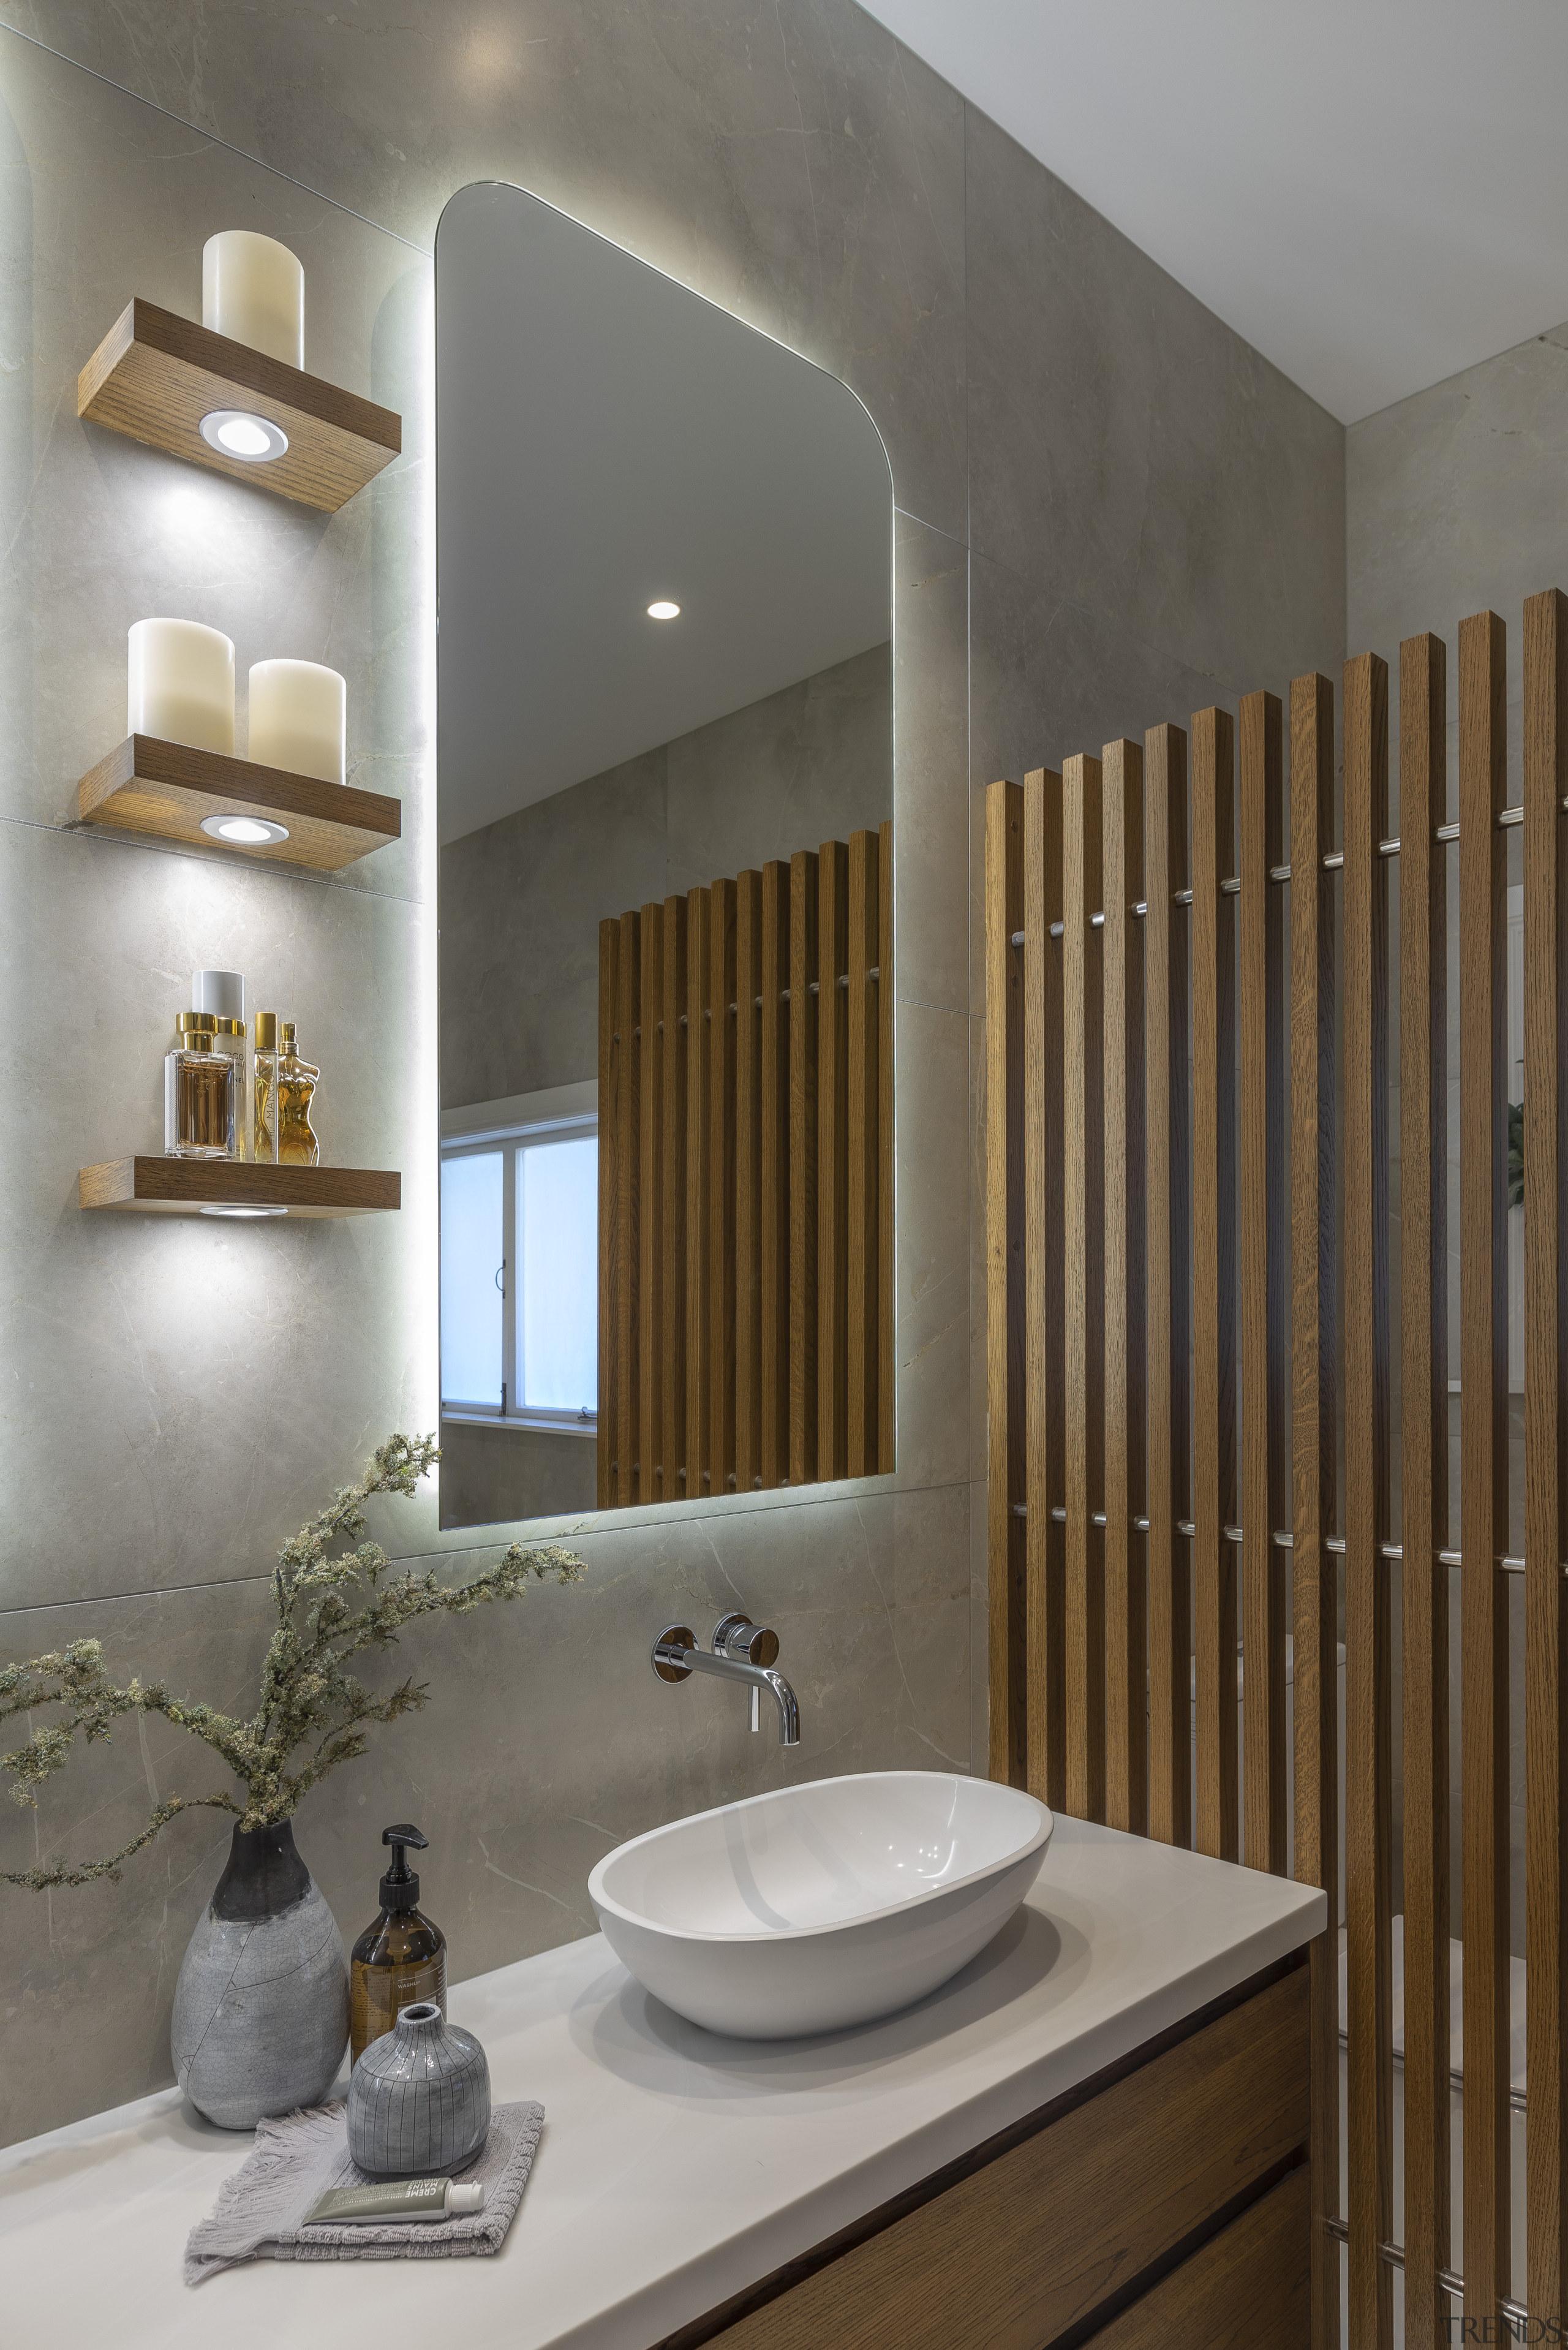 On this warm, elegant Kira Gray-designed main bathroom, gray